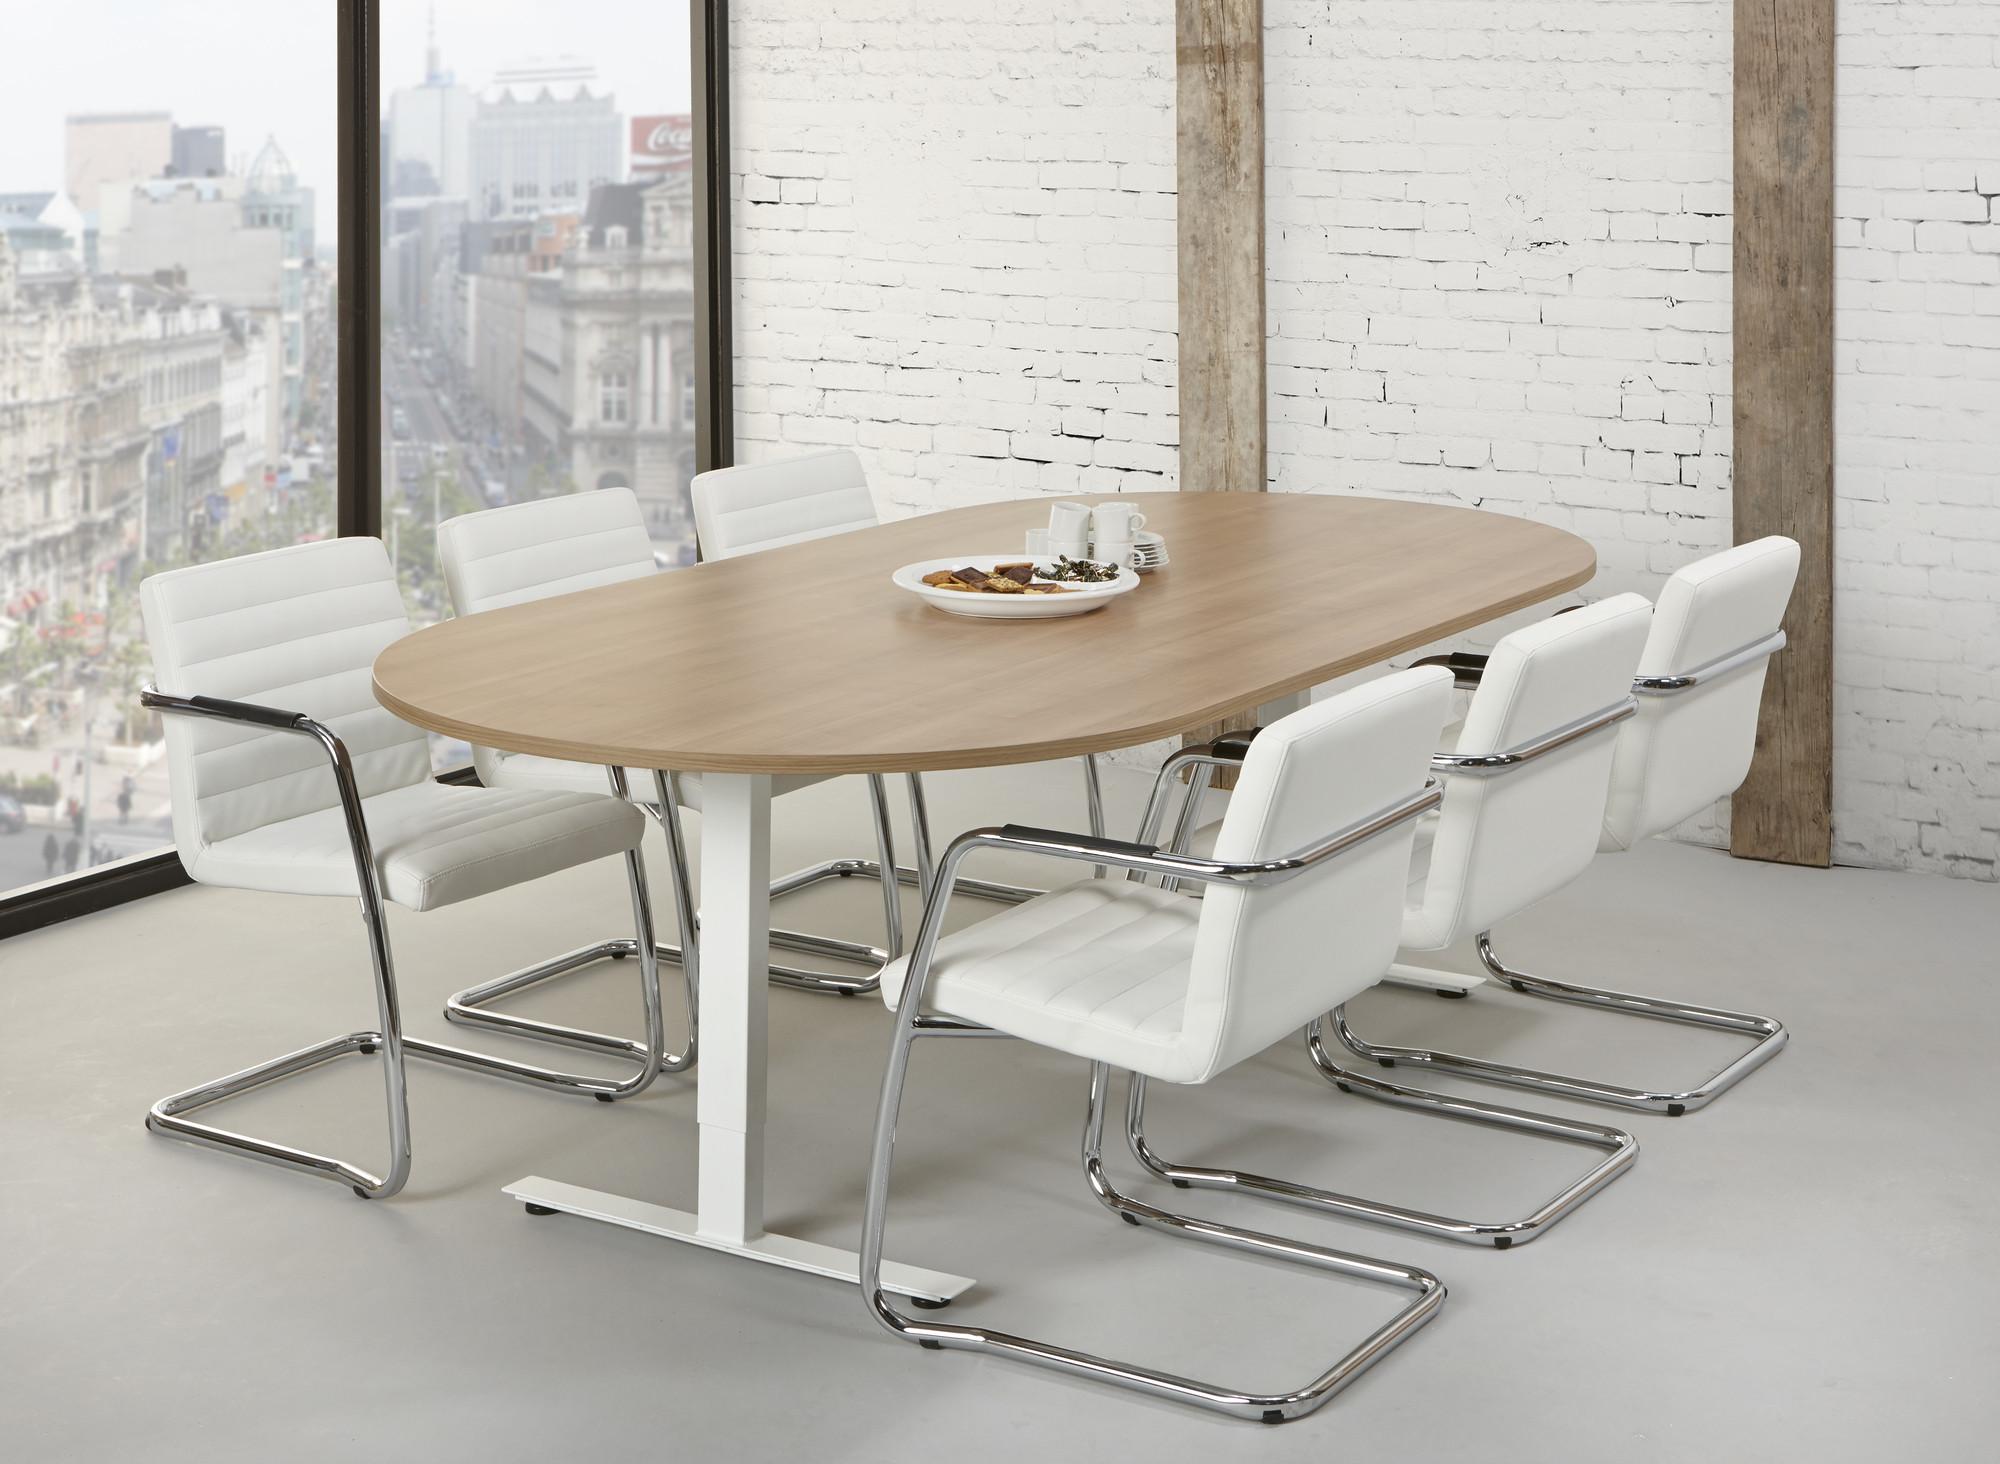 vergadertafel ovaal tendenz ovale vergadertafel 6 personen mv kantoor. Black Bedroom Furniture Sets. Home Design Ideas